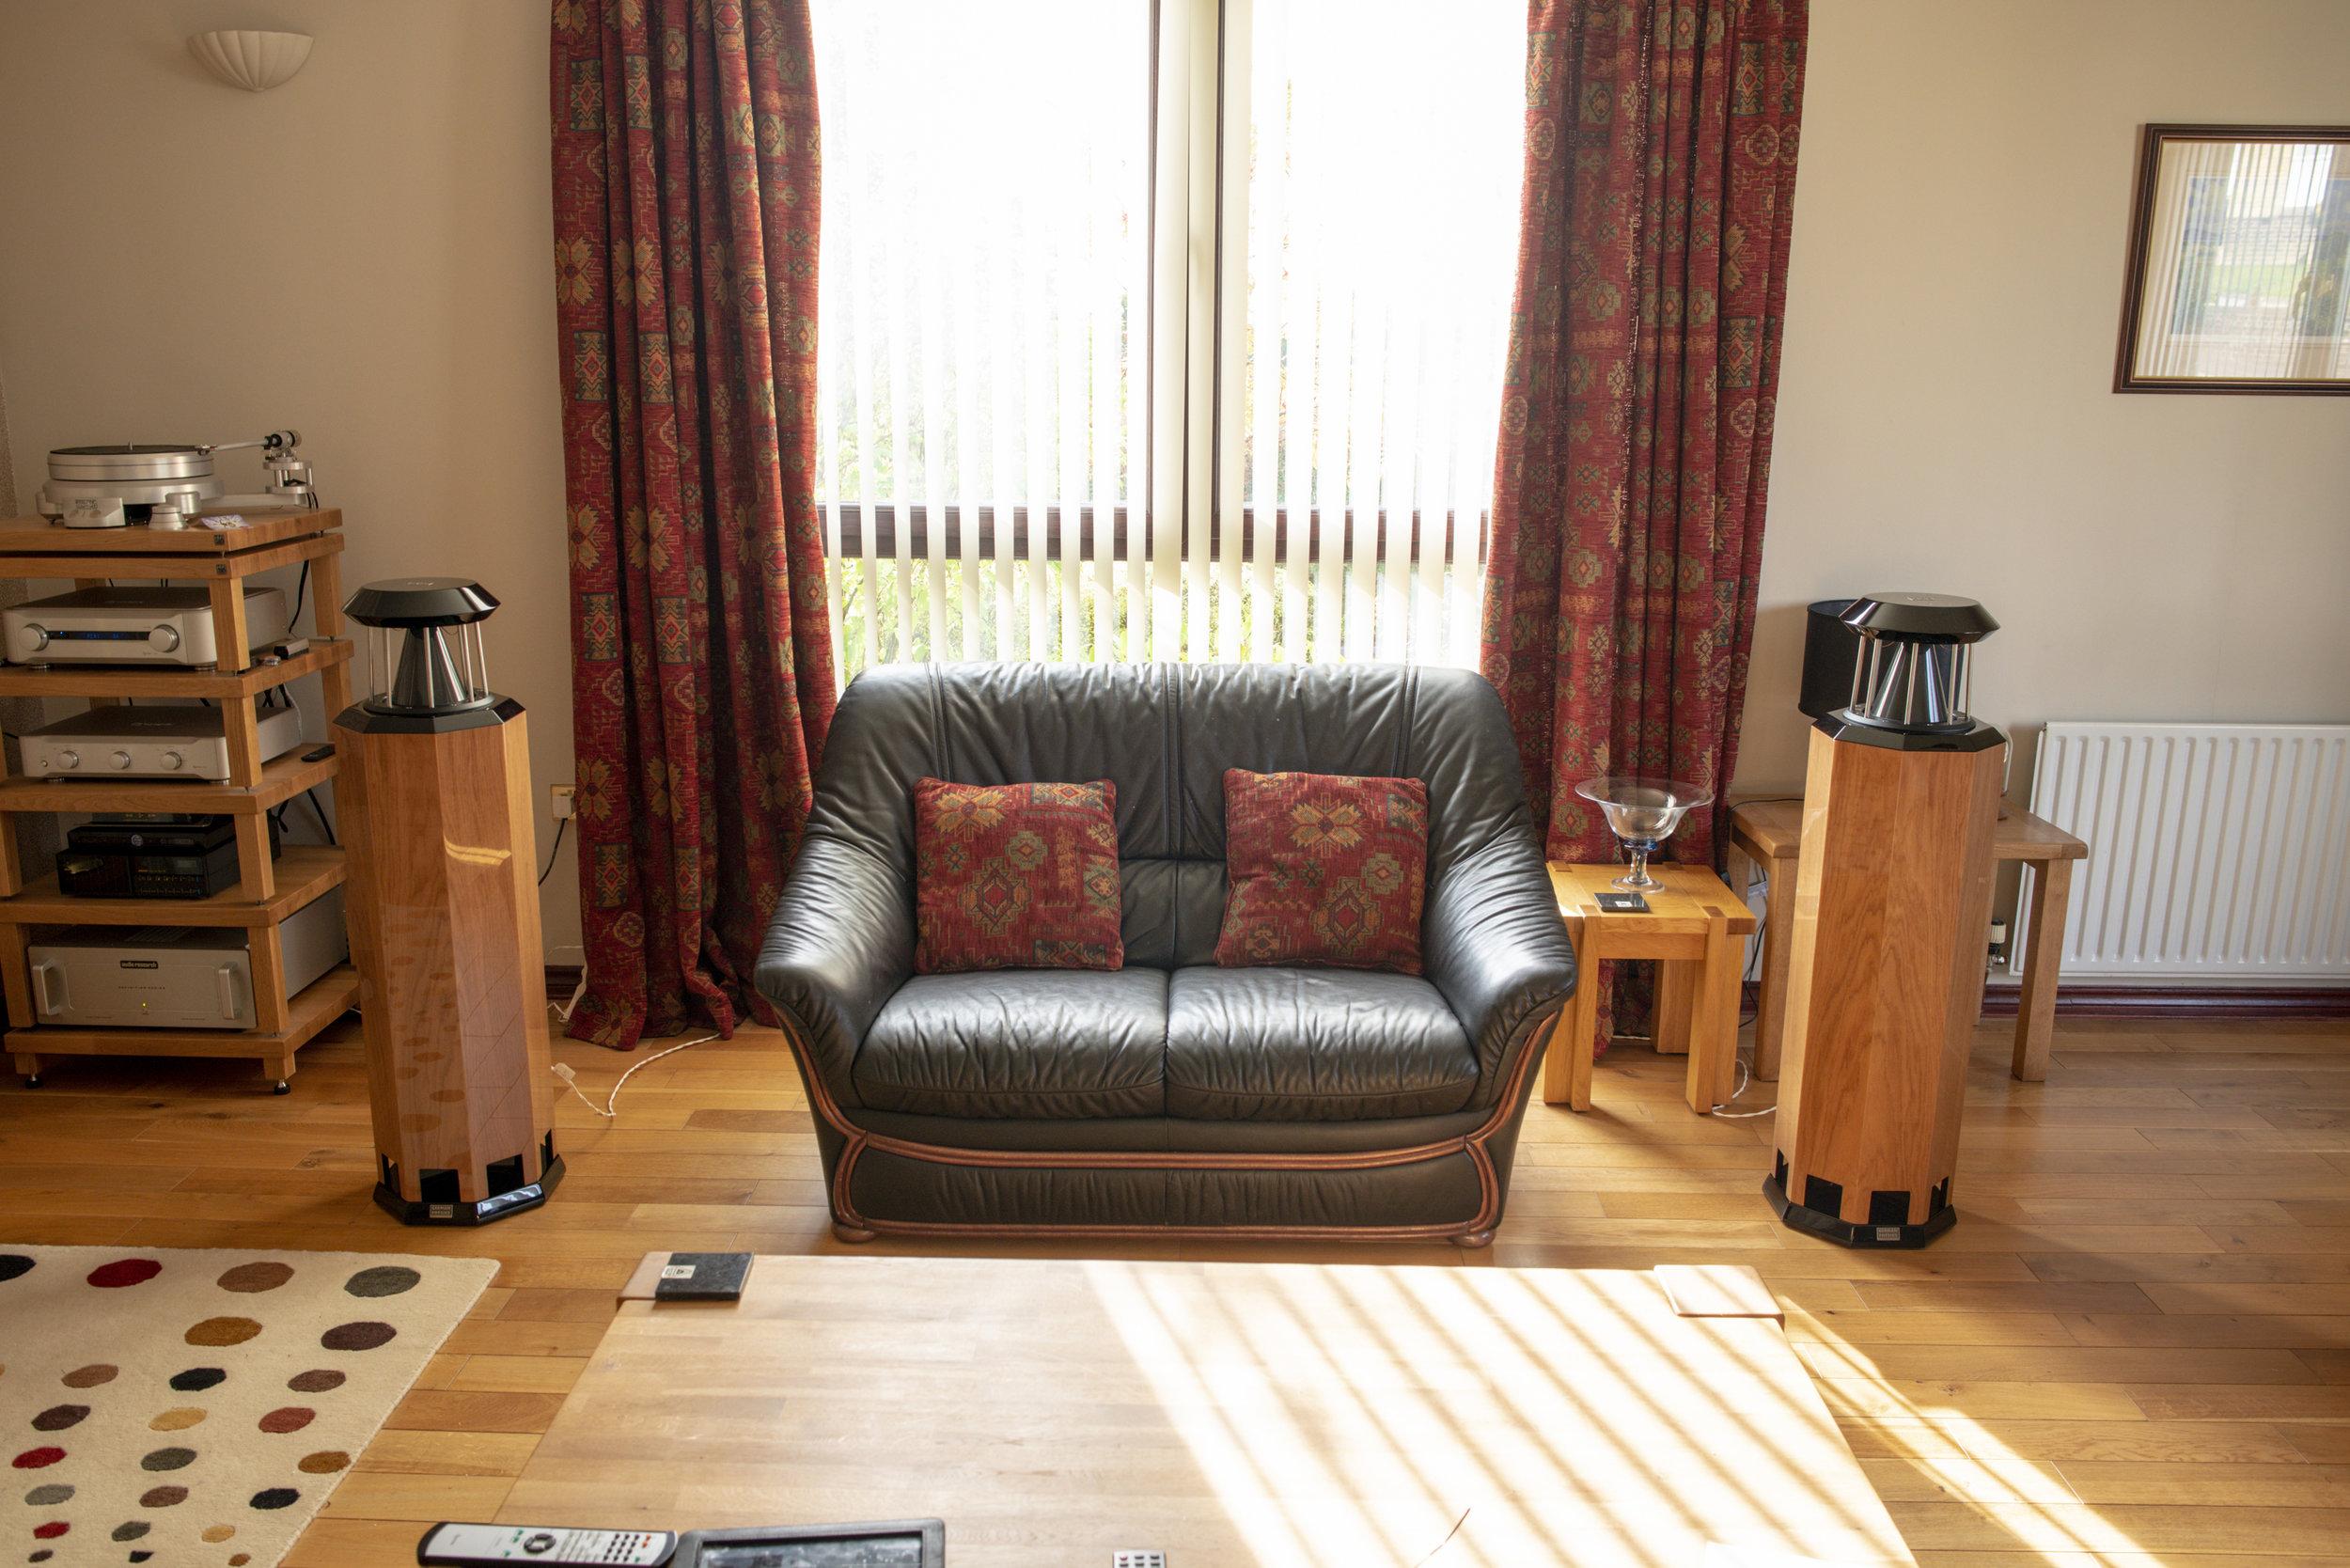 HRS-130 loudspeakers in high polish oak | Customer, Scotland